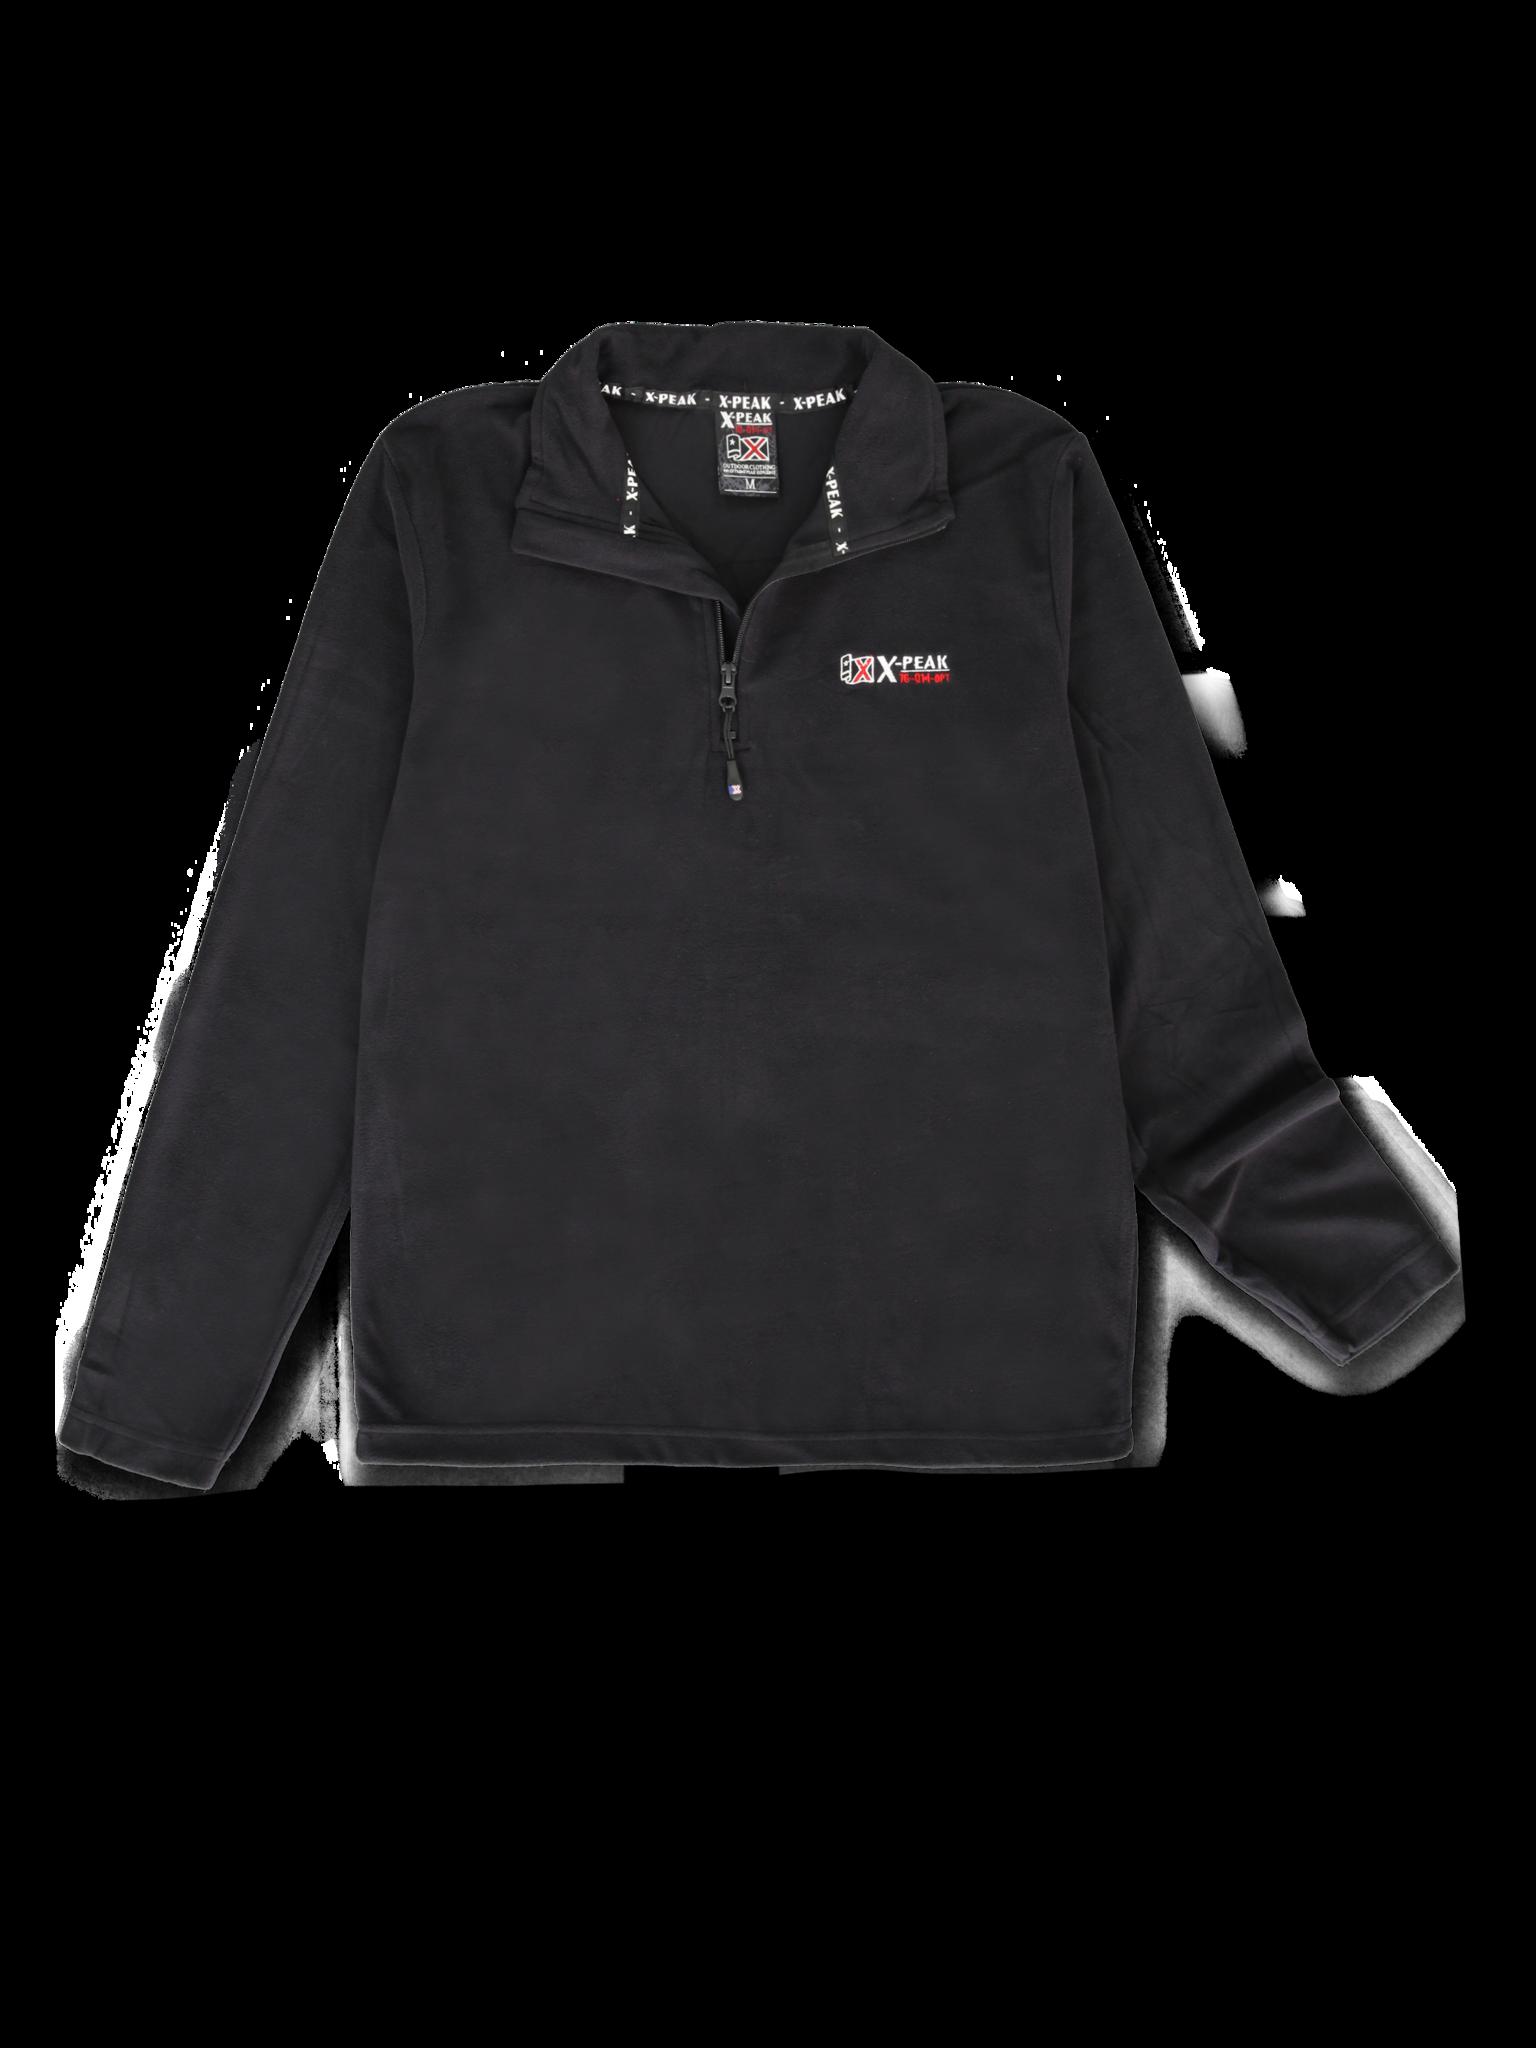 All Brands | Winterproducts Men | Sweatshirt | 30 pcs/box